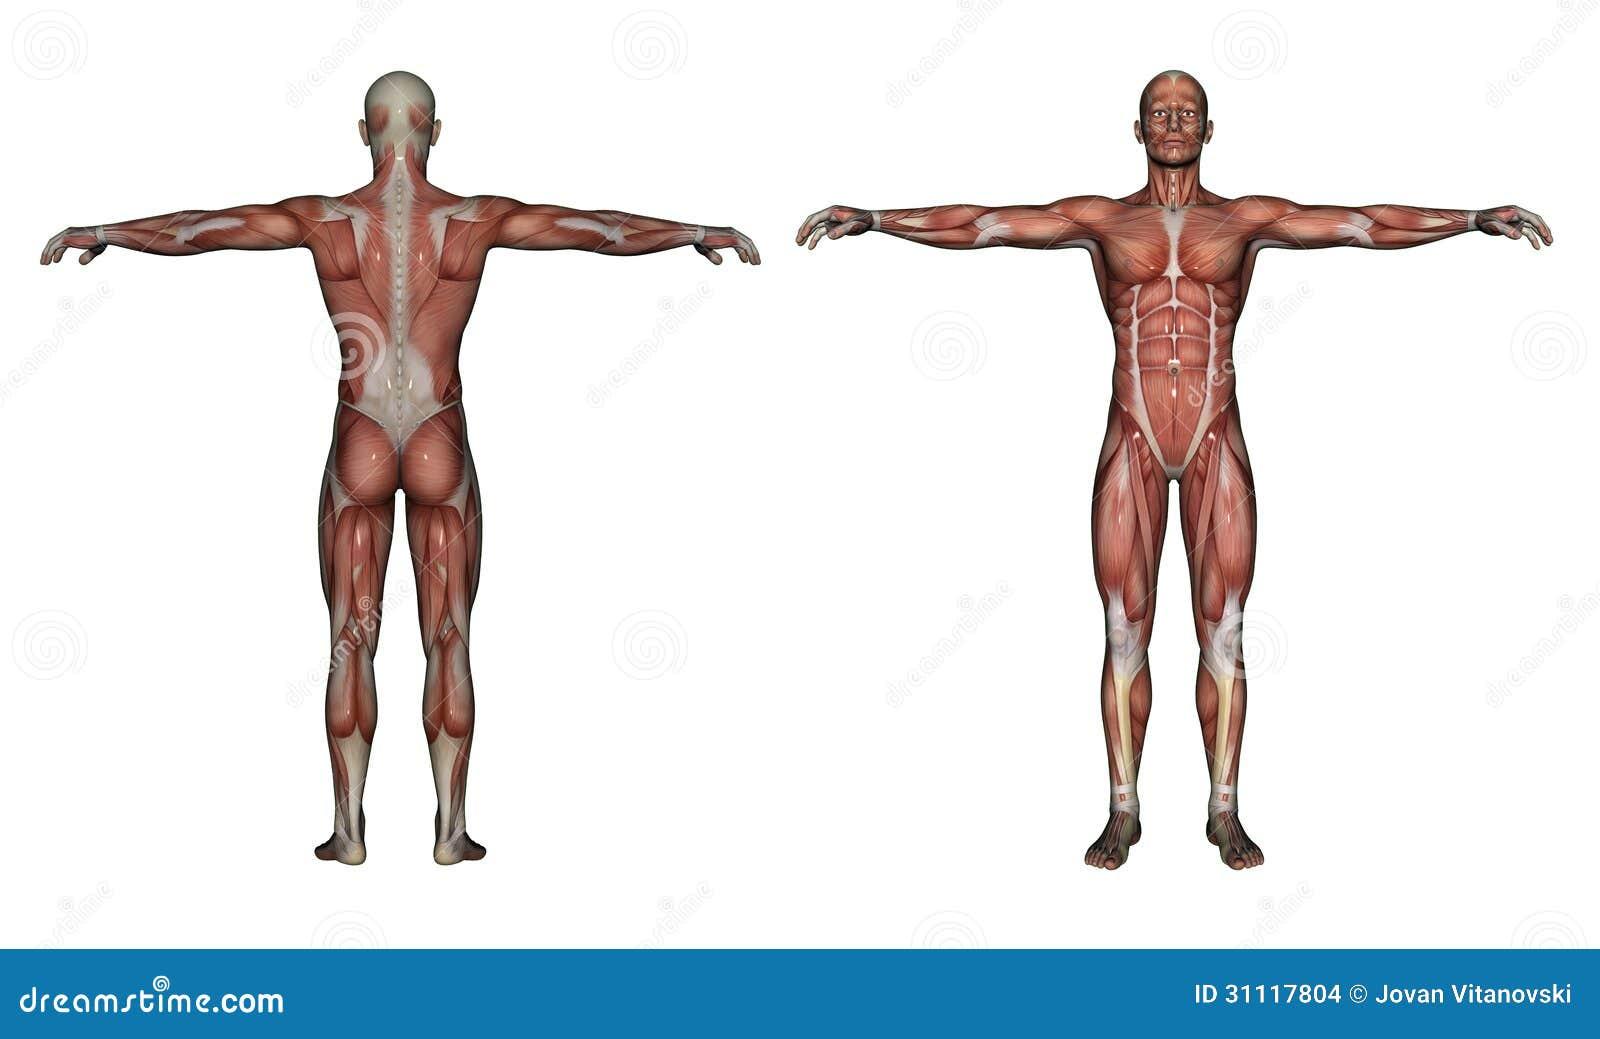 Human Anatomy - Male Muscles Stock Illustration - Illustration of ...